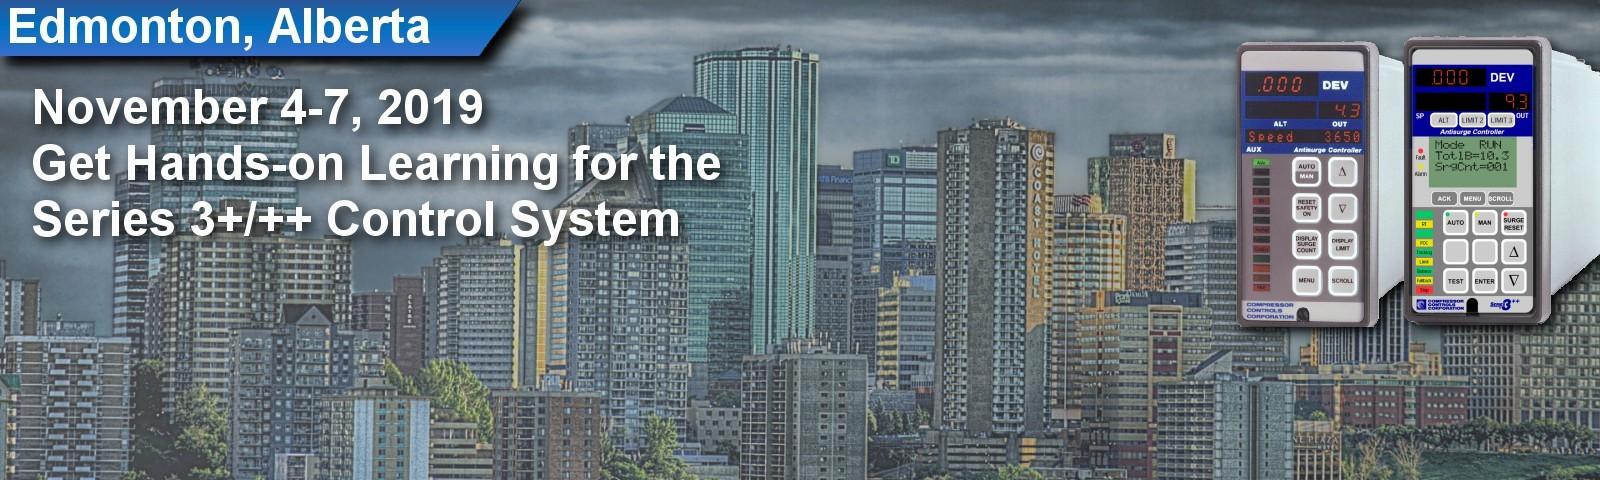 2019 Edmonton S3+/++ Regional Training | <a  data-cke-saved-href='https://learning.cccglobal.com/ProductDetails.aspx?ProductID=263' href='https://learning.cccglobal.com/ProductDetails.aspx?ProductID=263'>Register Now</a>